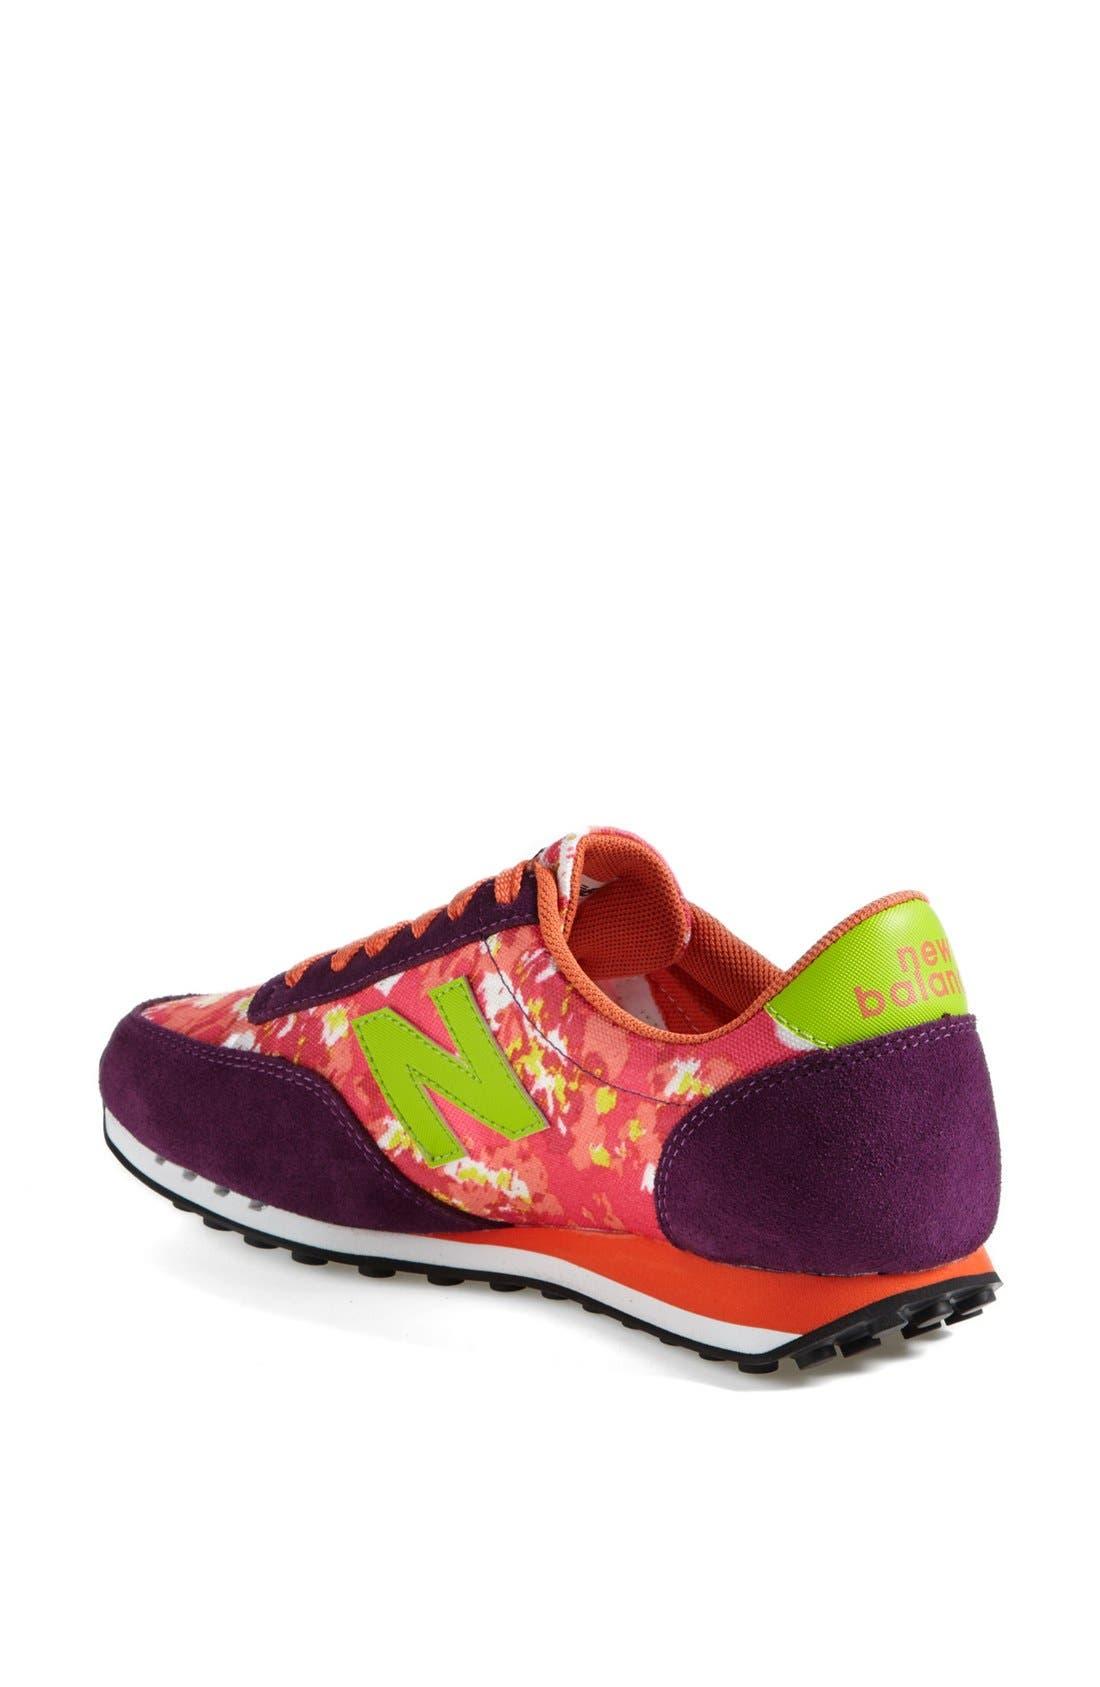 Alternate Image 2  - New Balance '410 Floral Blur' Sneaker (Women)